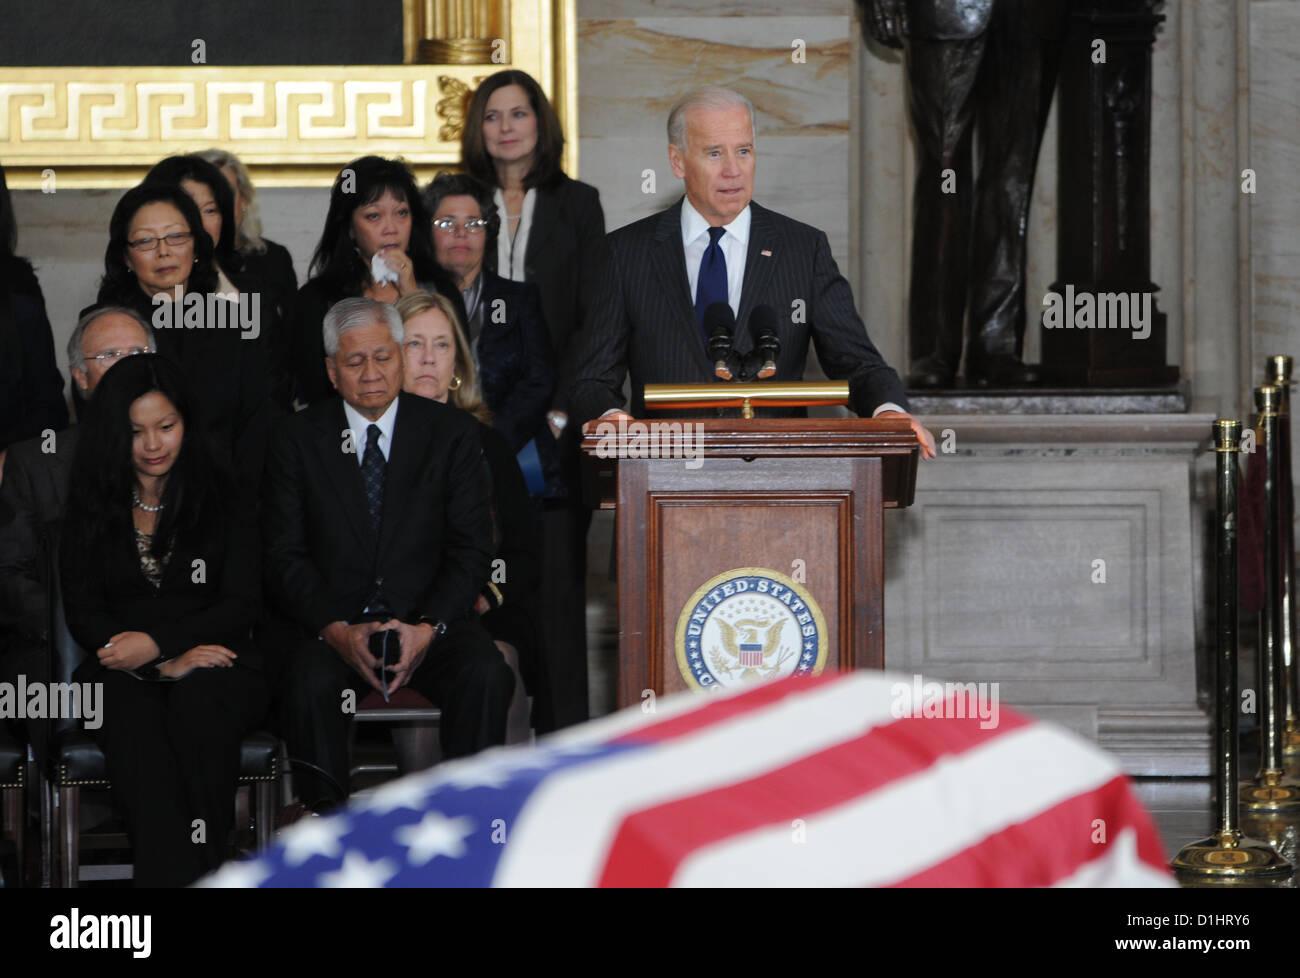 Vice President Joe Biden pays his respect to Senator Daniel Inouye lying in state in the Rotunda of the US Capitol Stock Photo